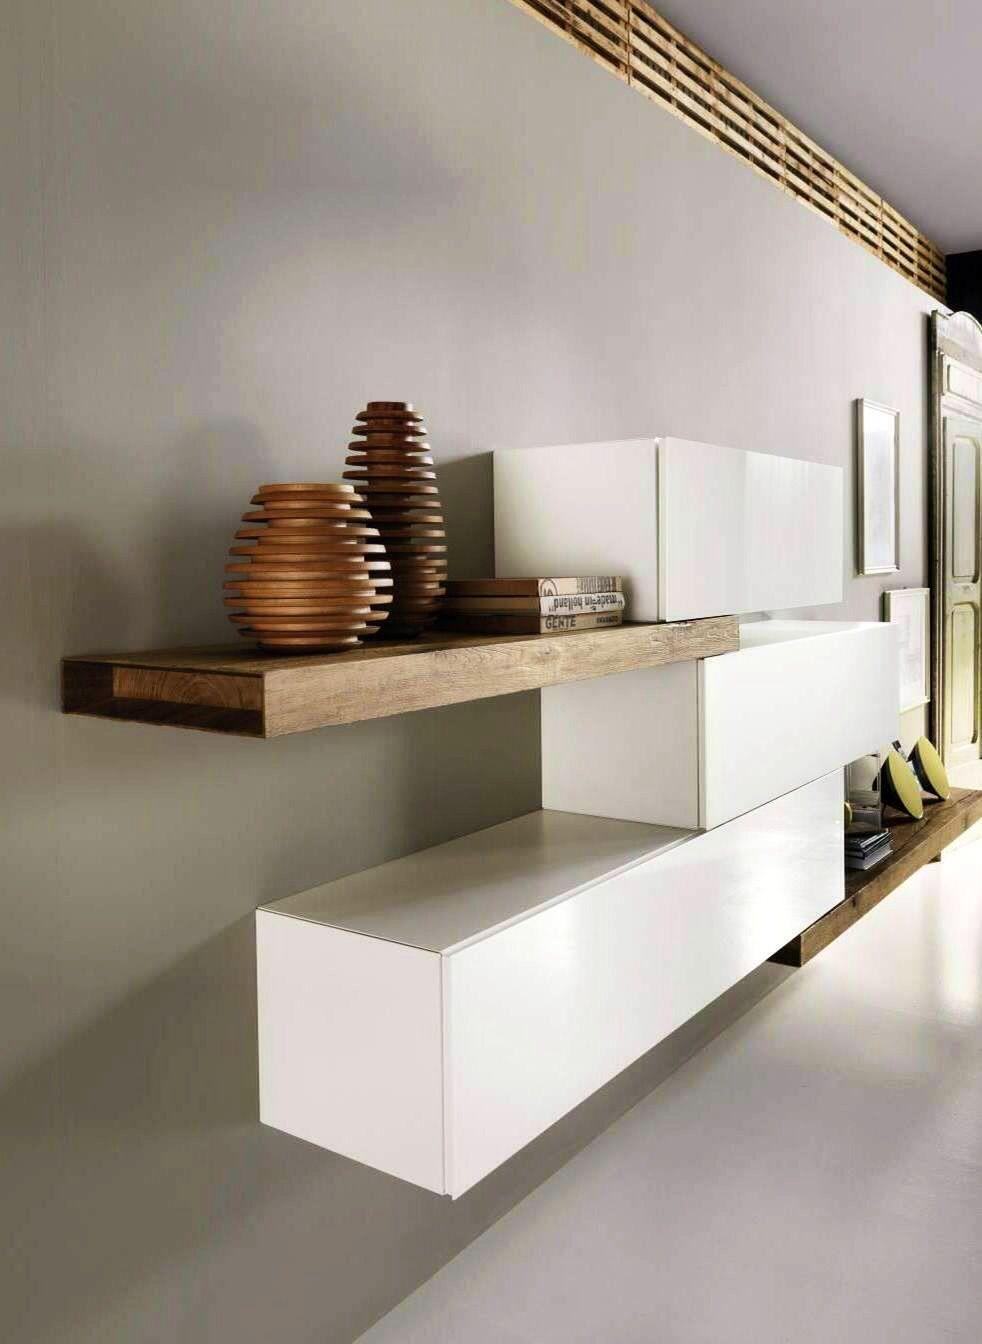 Lago Interior Design Living Arlydesignparis Meuble Salle A Manger Deco Maison Meuble Suspendu Salon